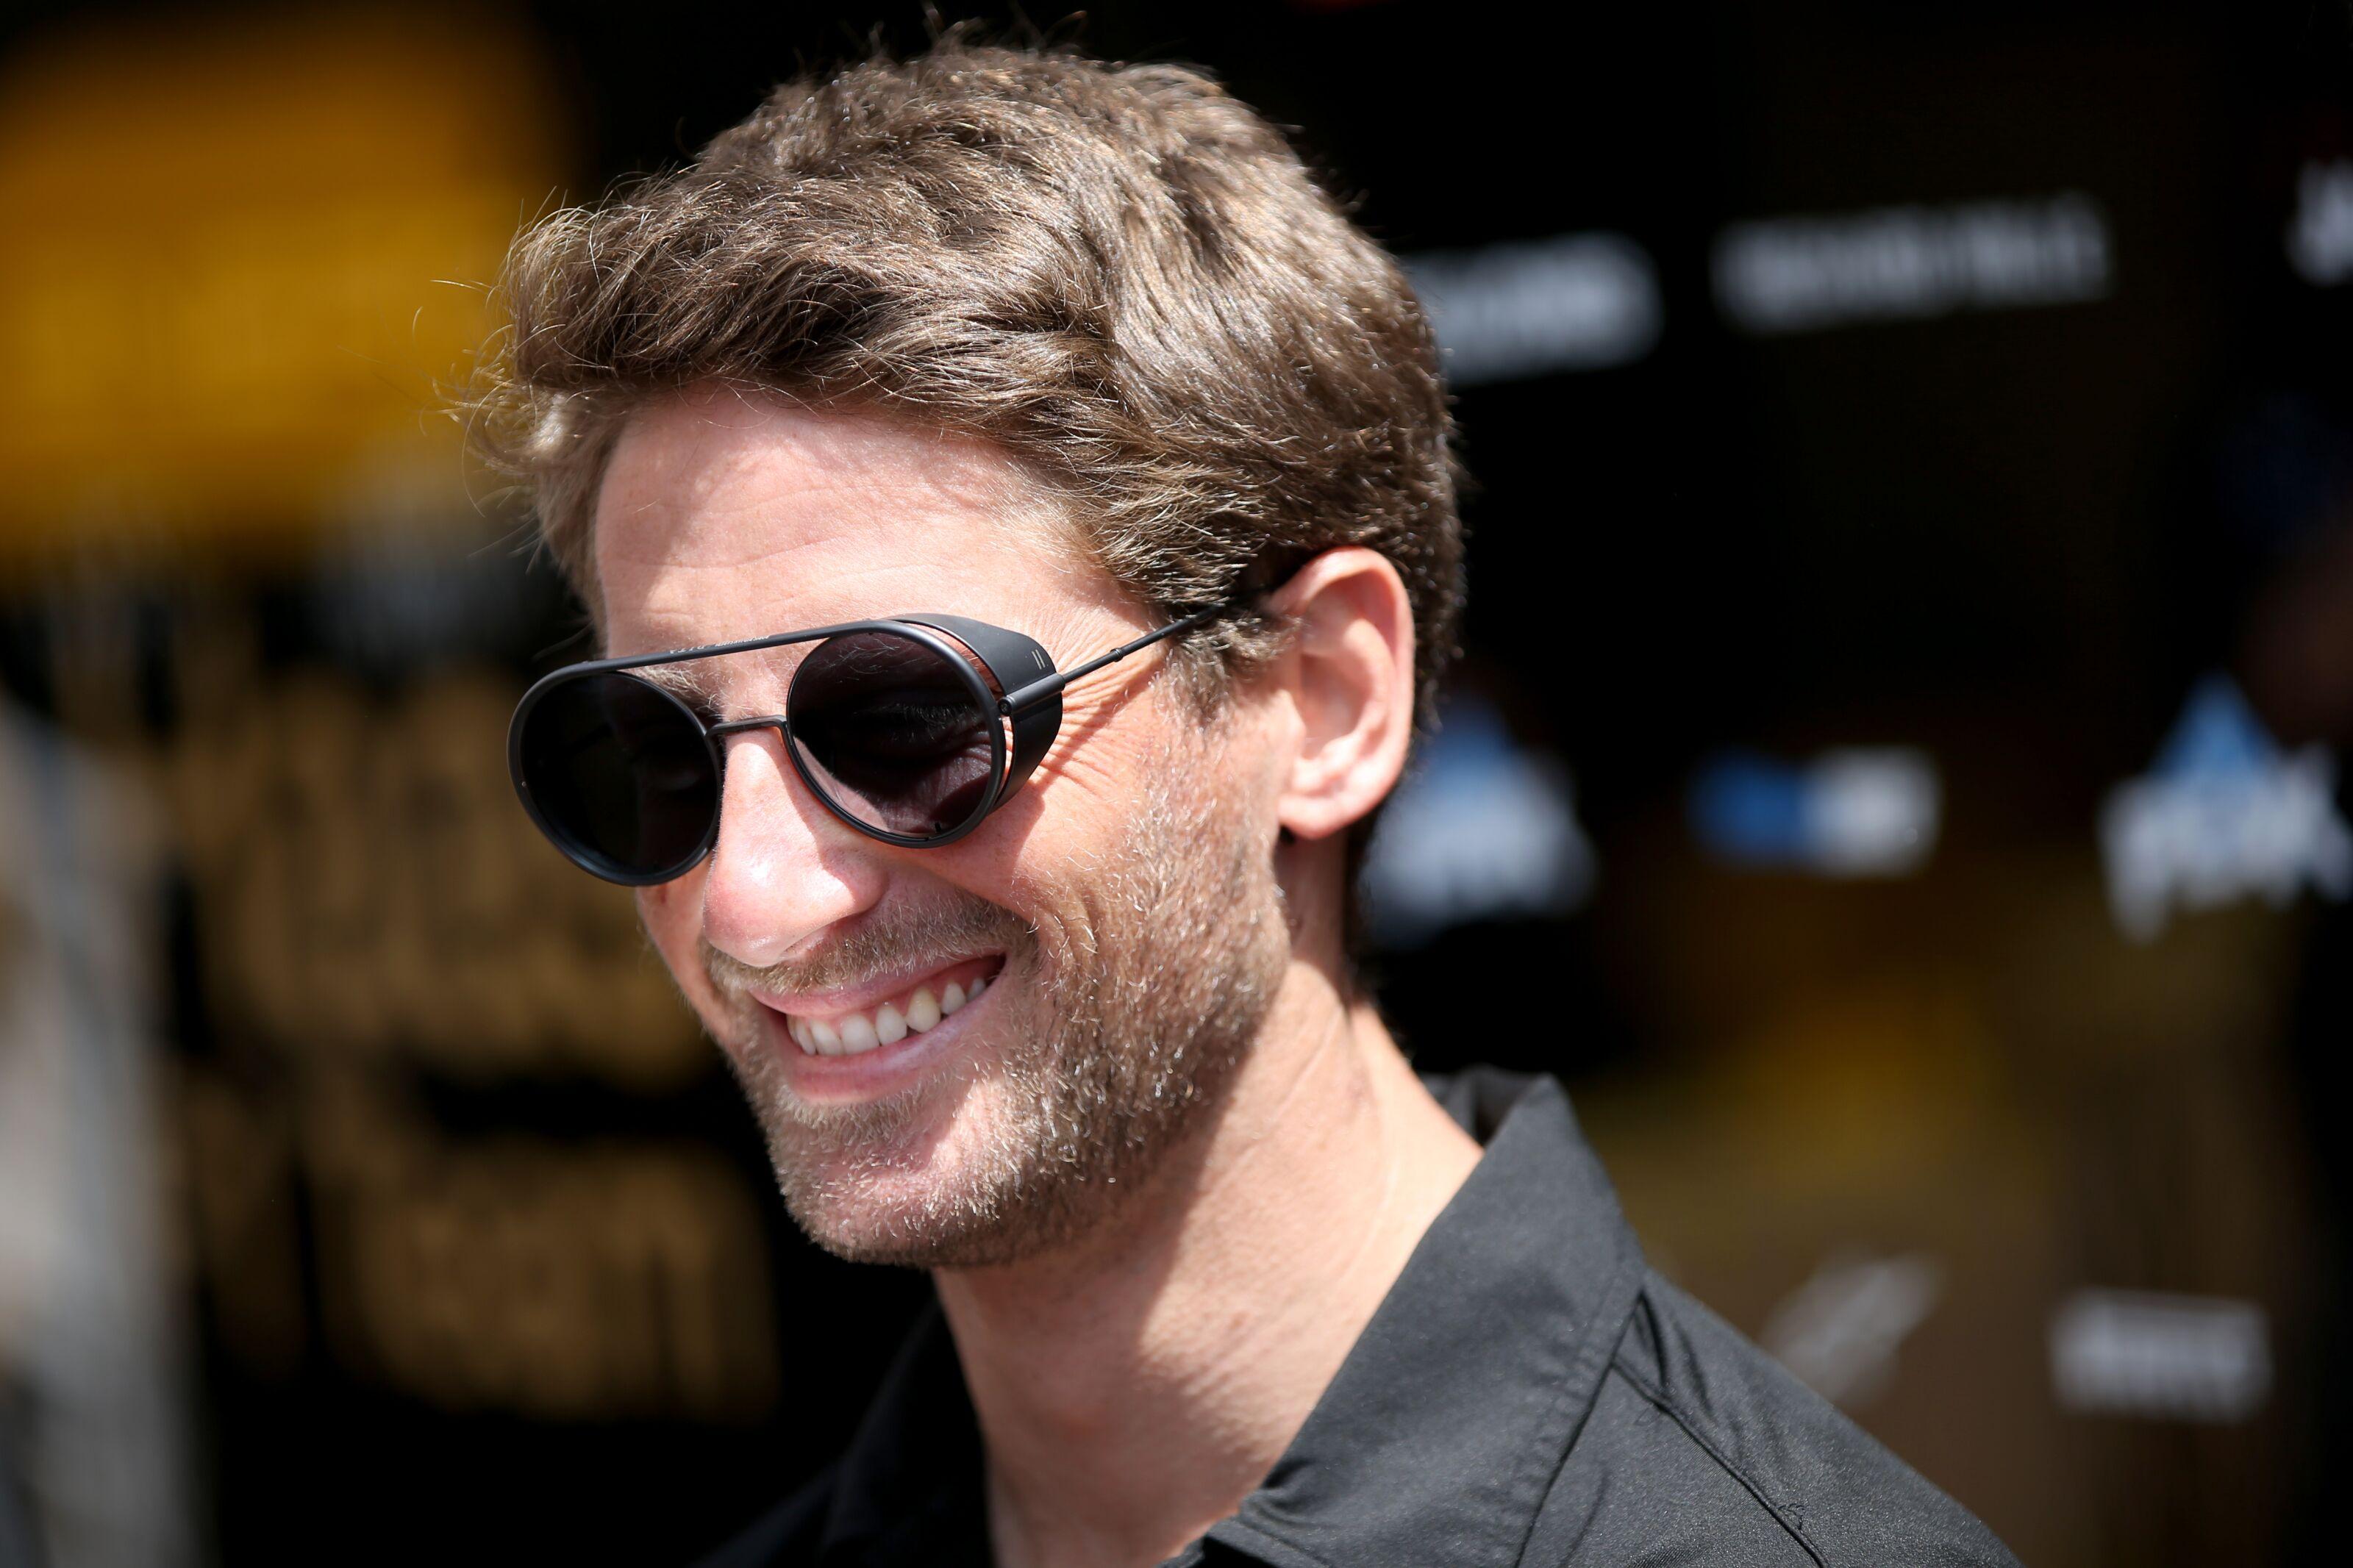 Formula 1: Romain Grosjean thwarts burglary attempt, protects family